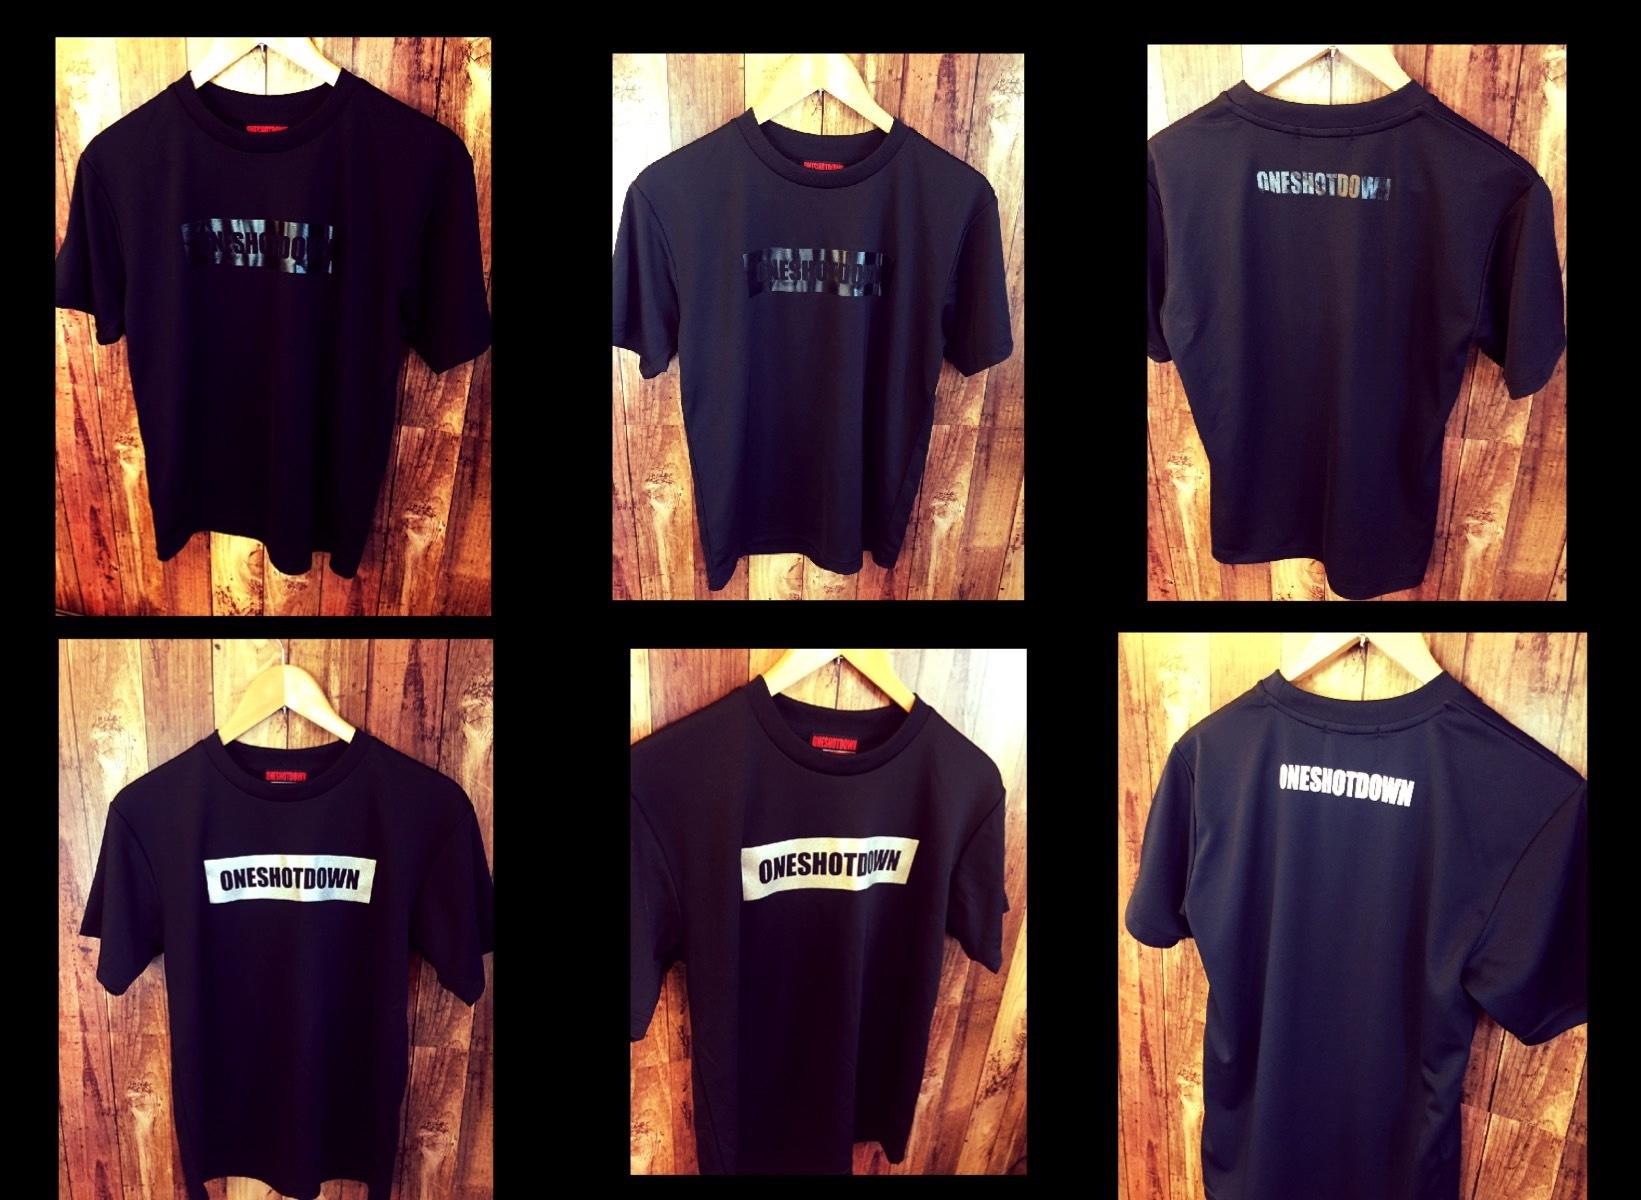 ONESHOTDOWN ボックスロゴ ドライTシャツ - 画像4